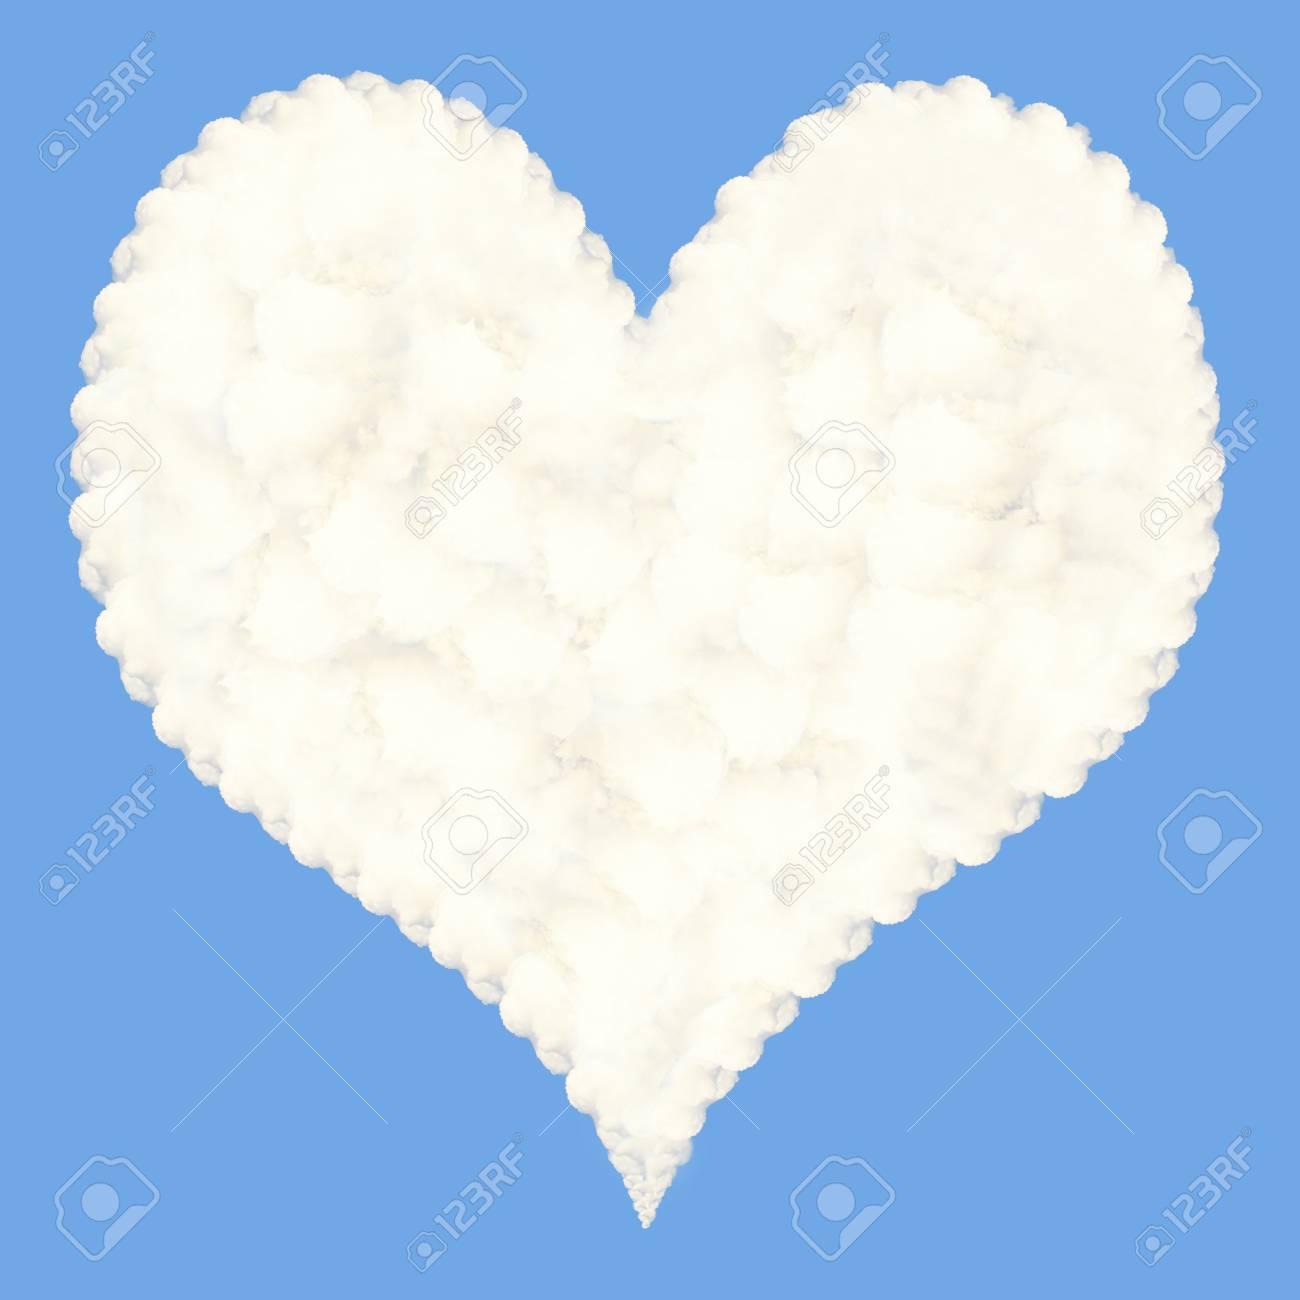 Heart-shaped cloud Stock Photo - 15956763